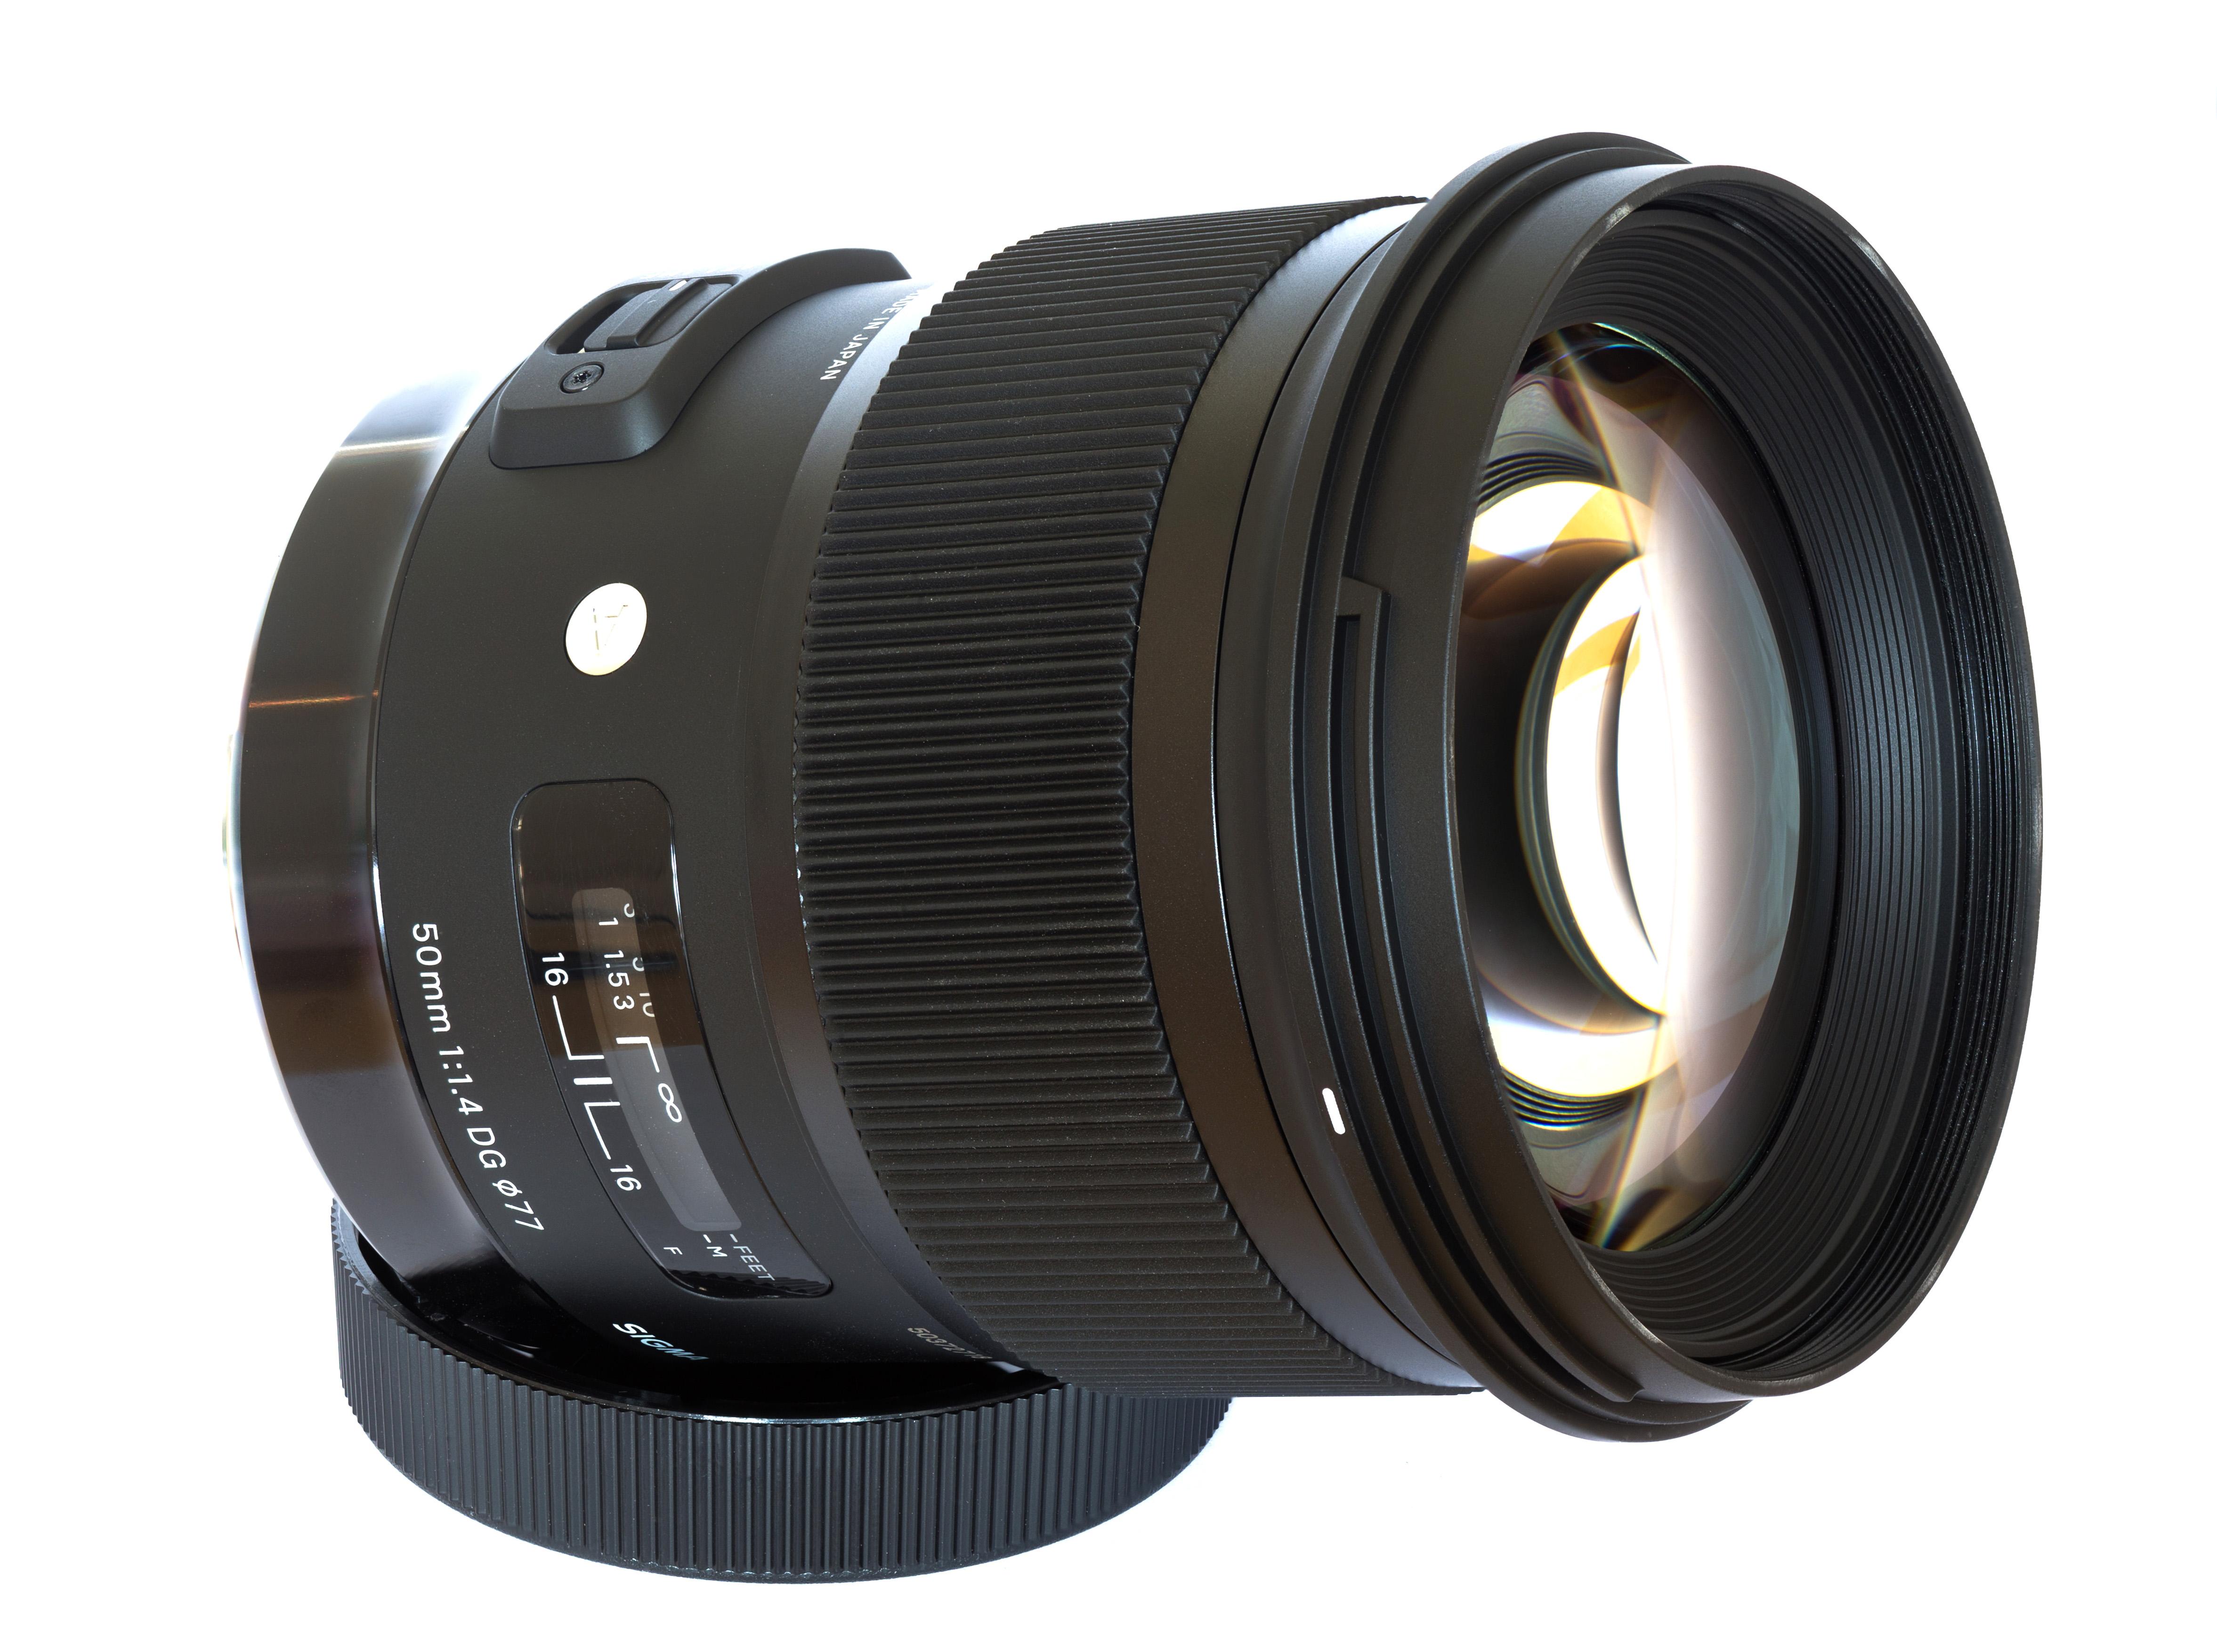 Sigma 50mm F 1 4 Dg Hsm A Lens Wikipedia